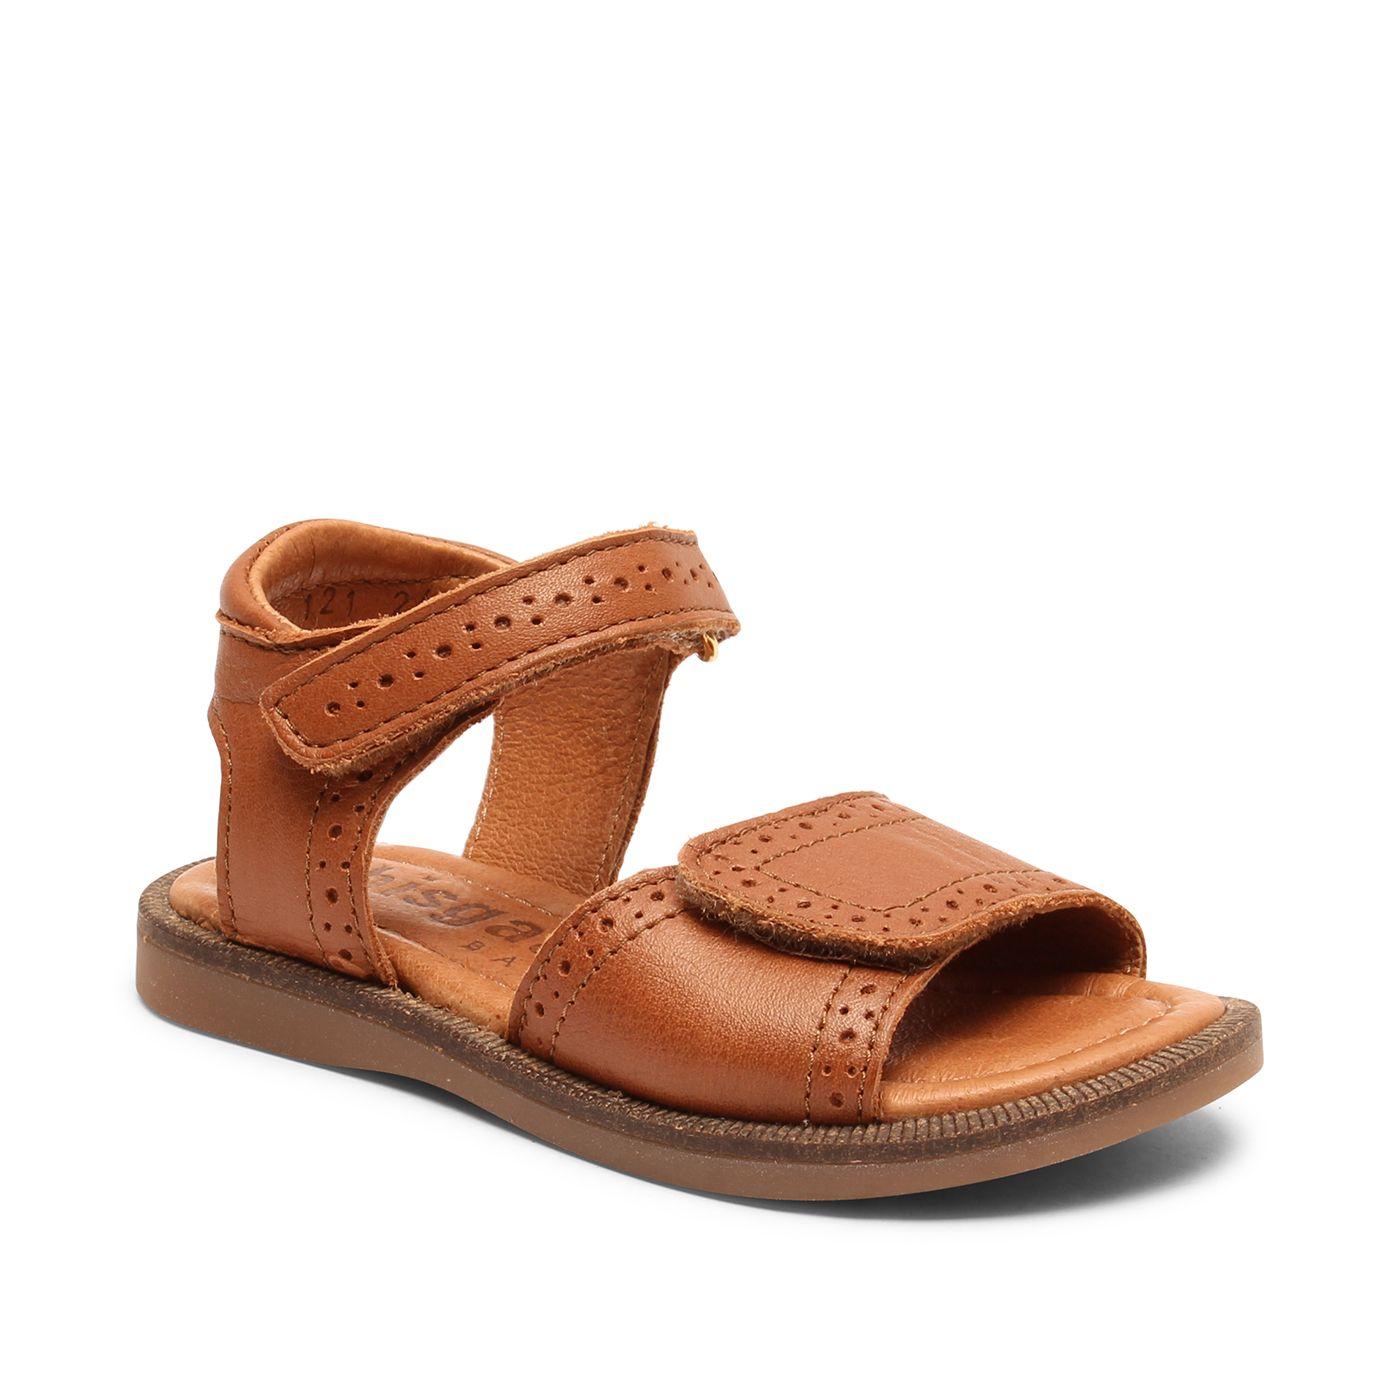 Bisgaard dívčí kožené sandály 70706 - 1332